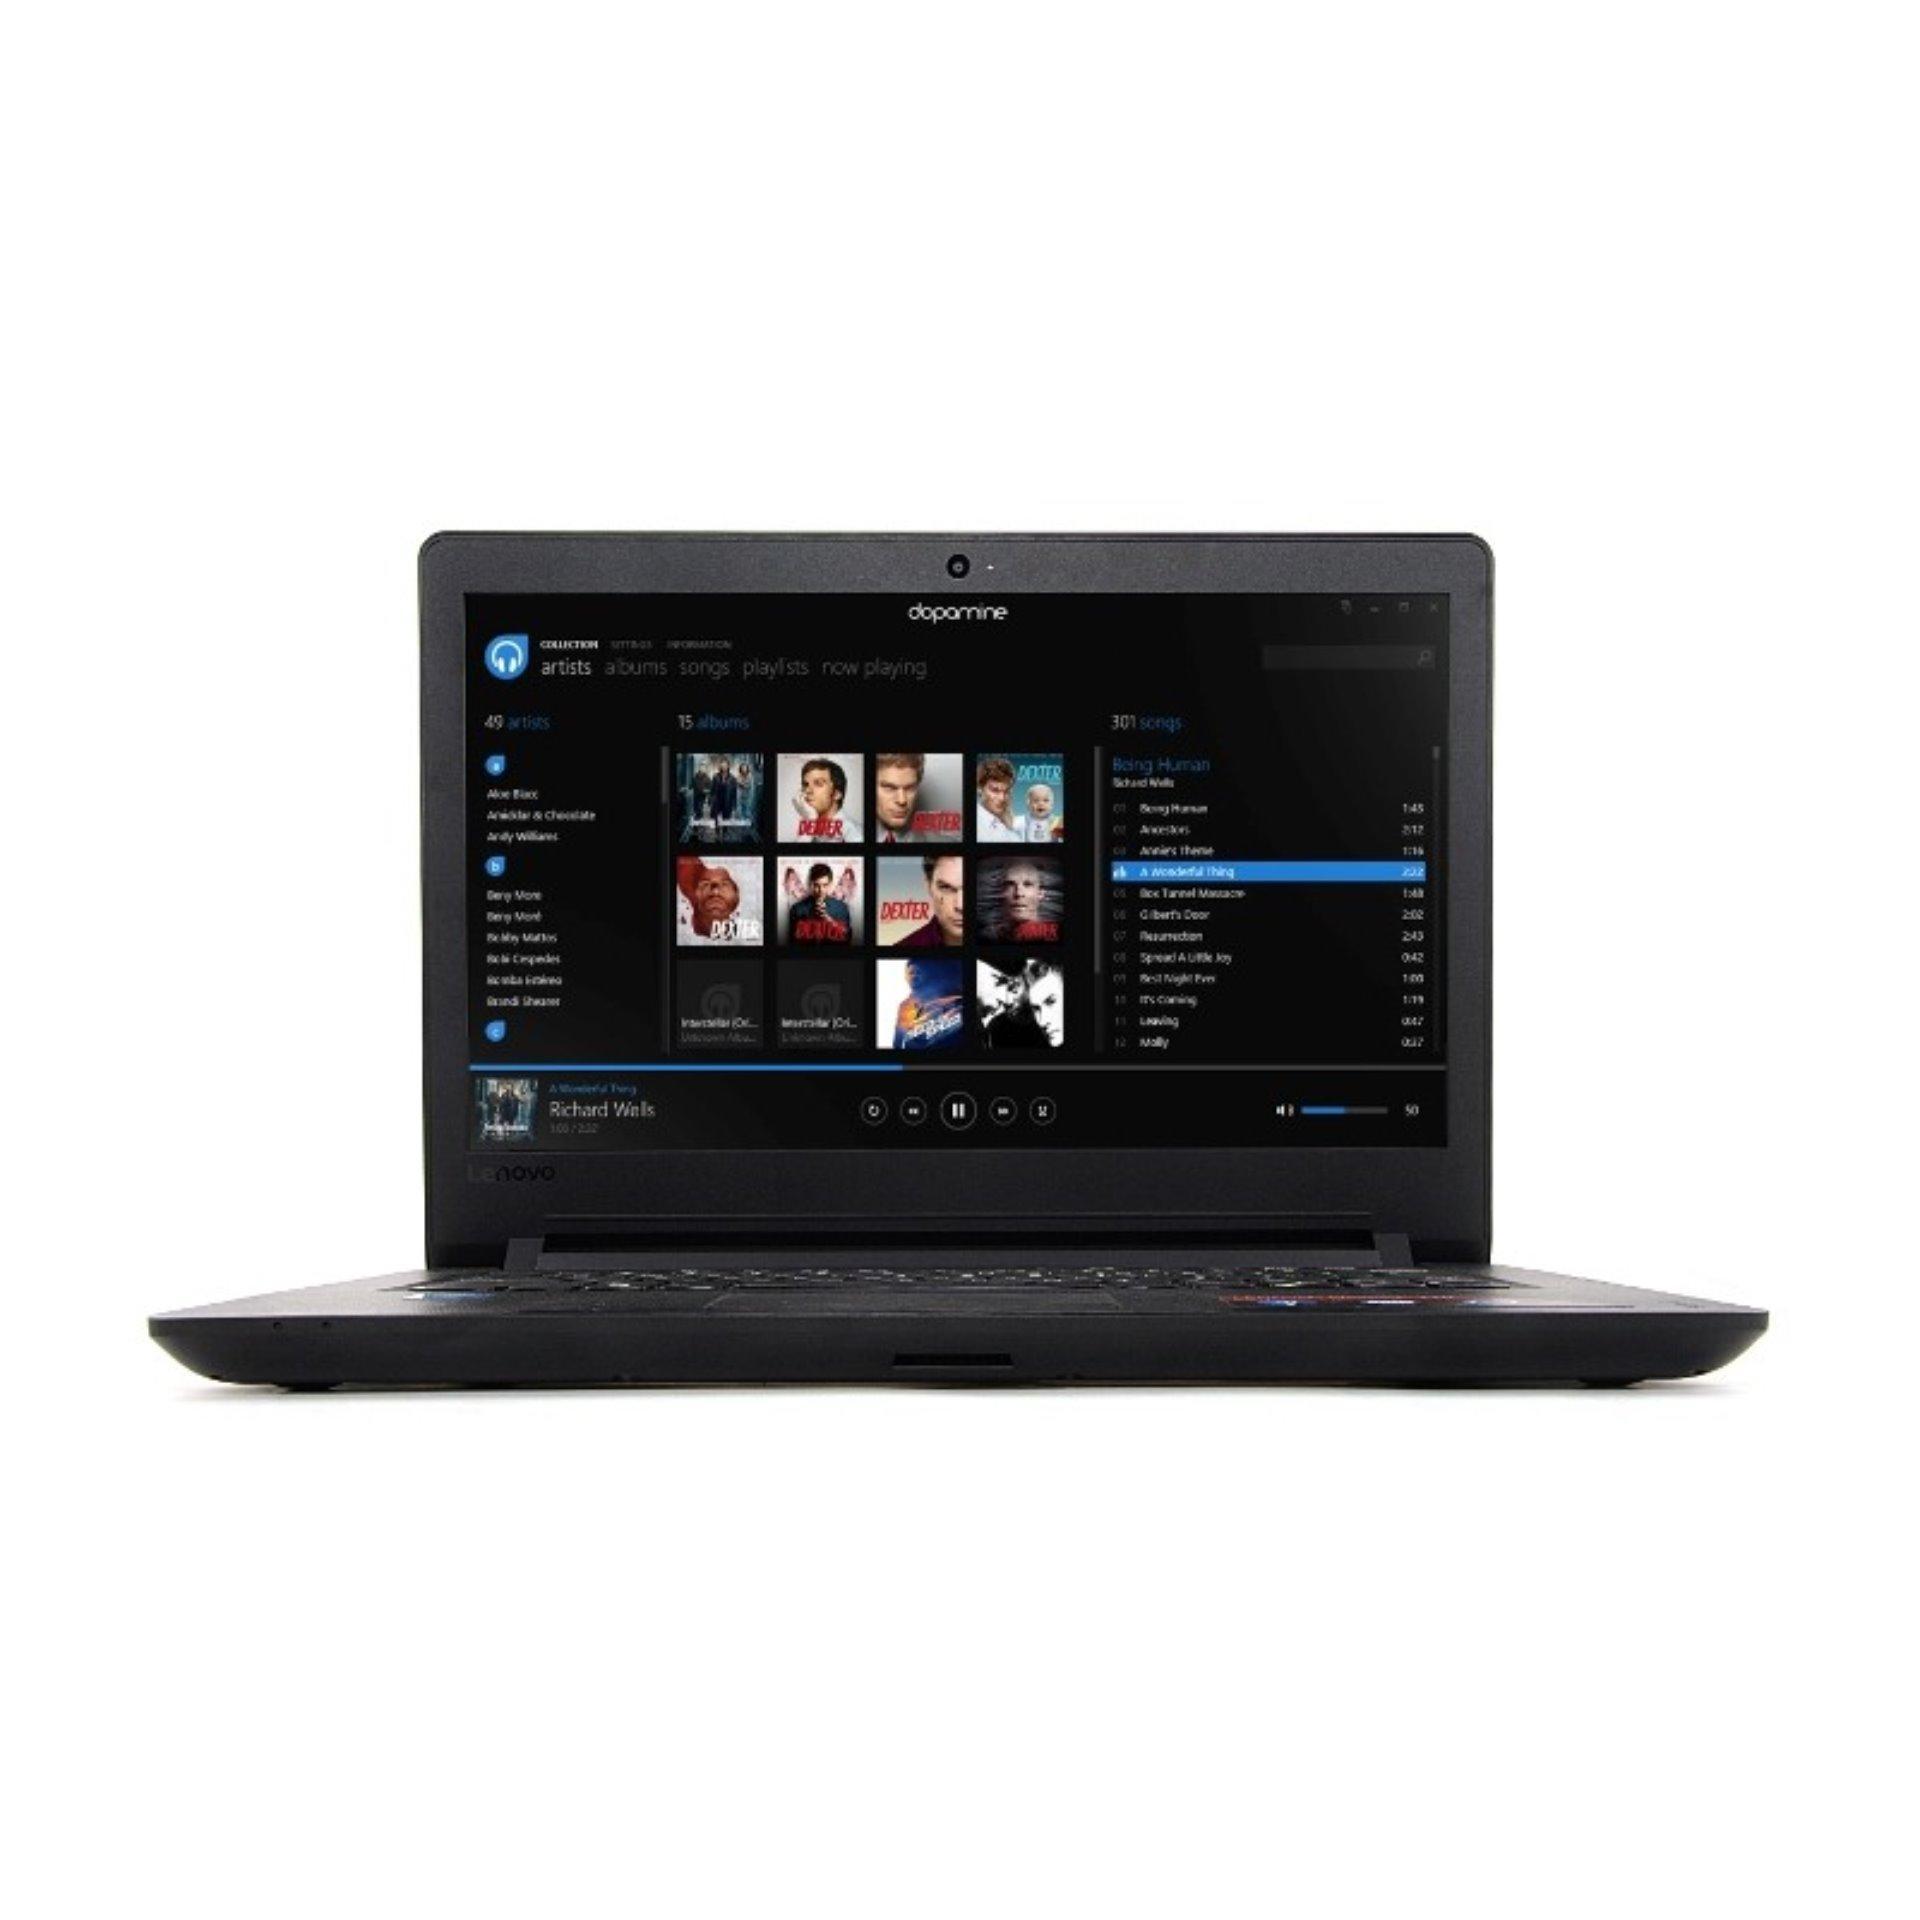 Laptop Resmi Lenovo IP 110 14IBR 8GID Cel N3060 Ram4GB Hdd1TB Dvdrw Dos Layar